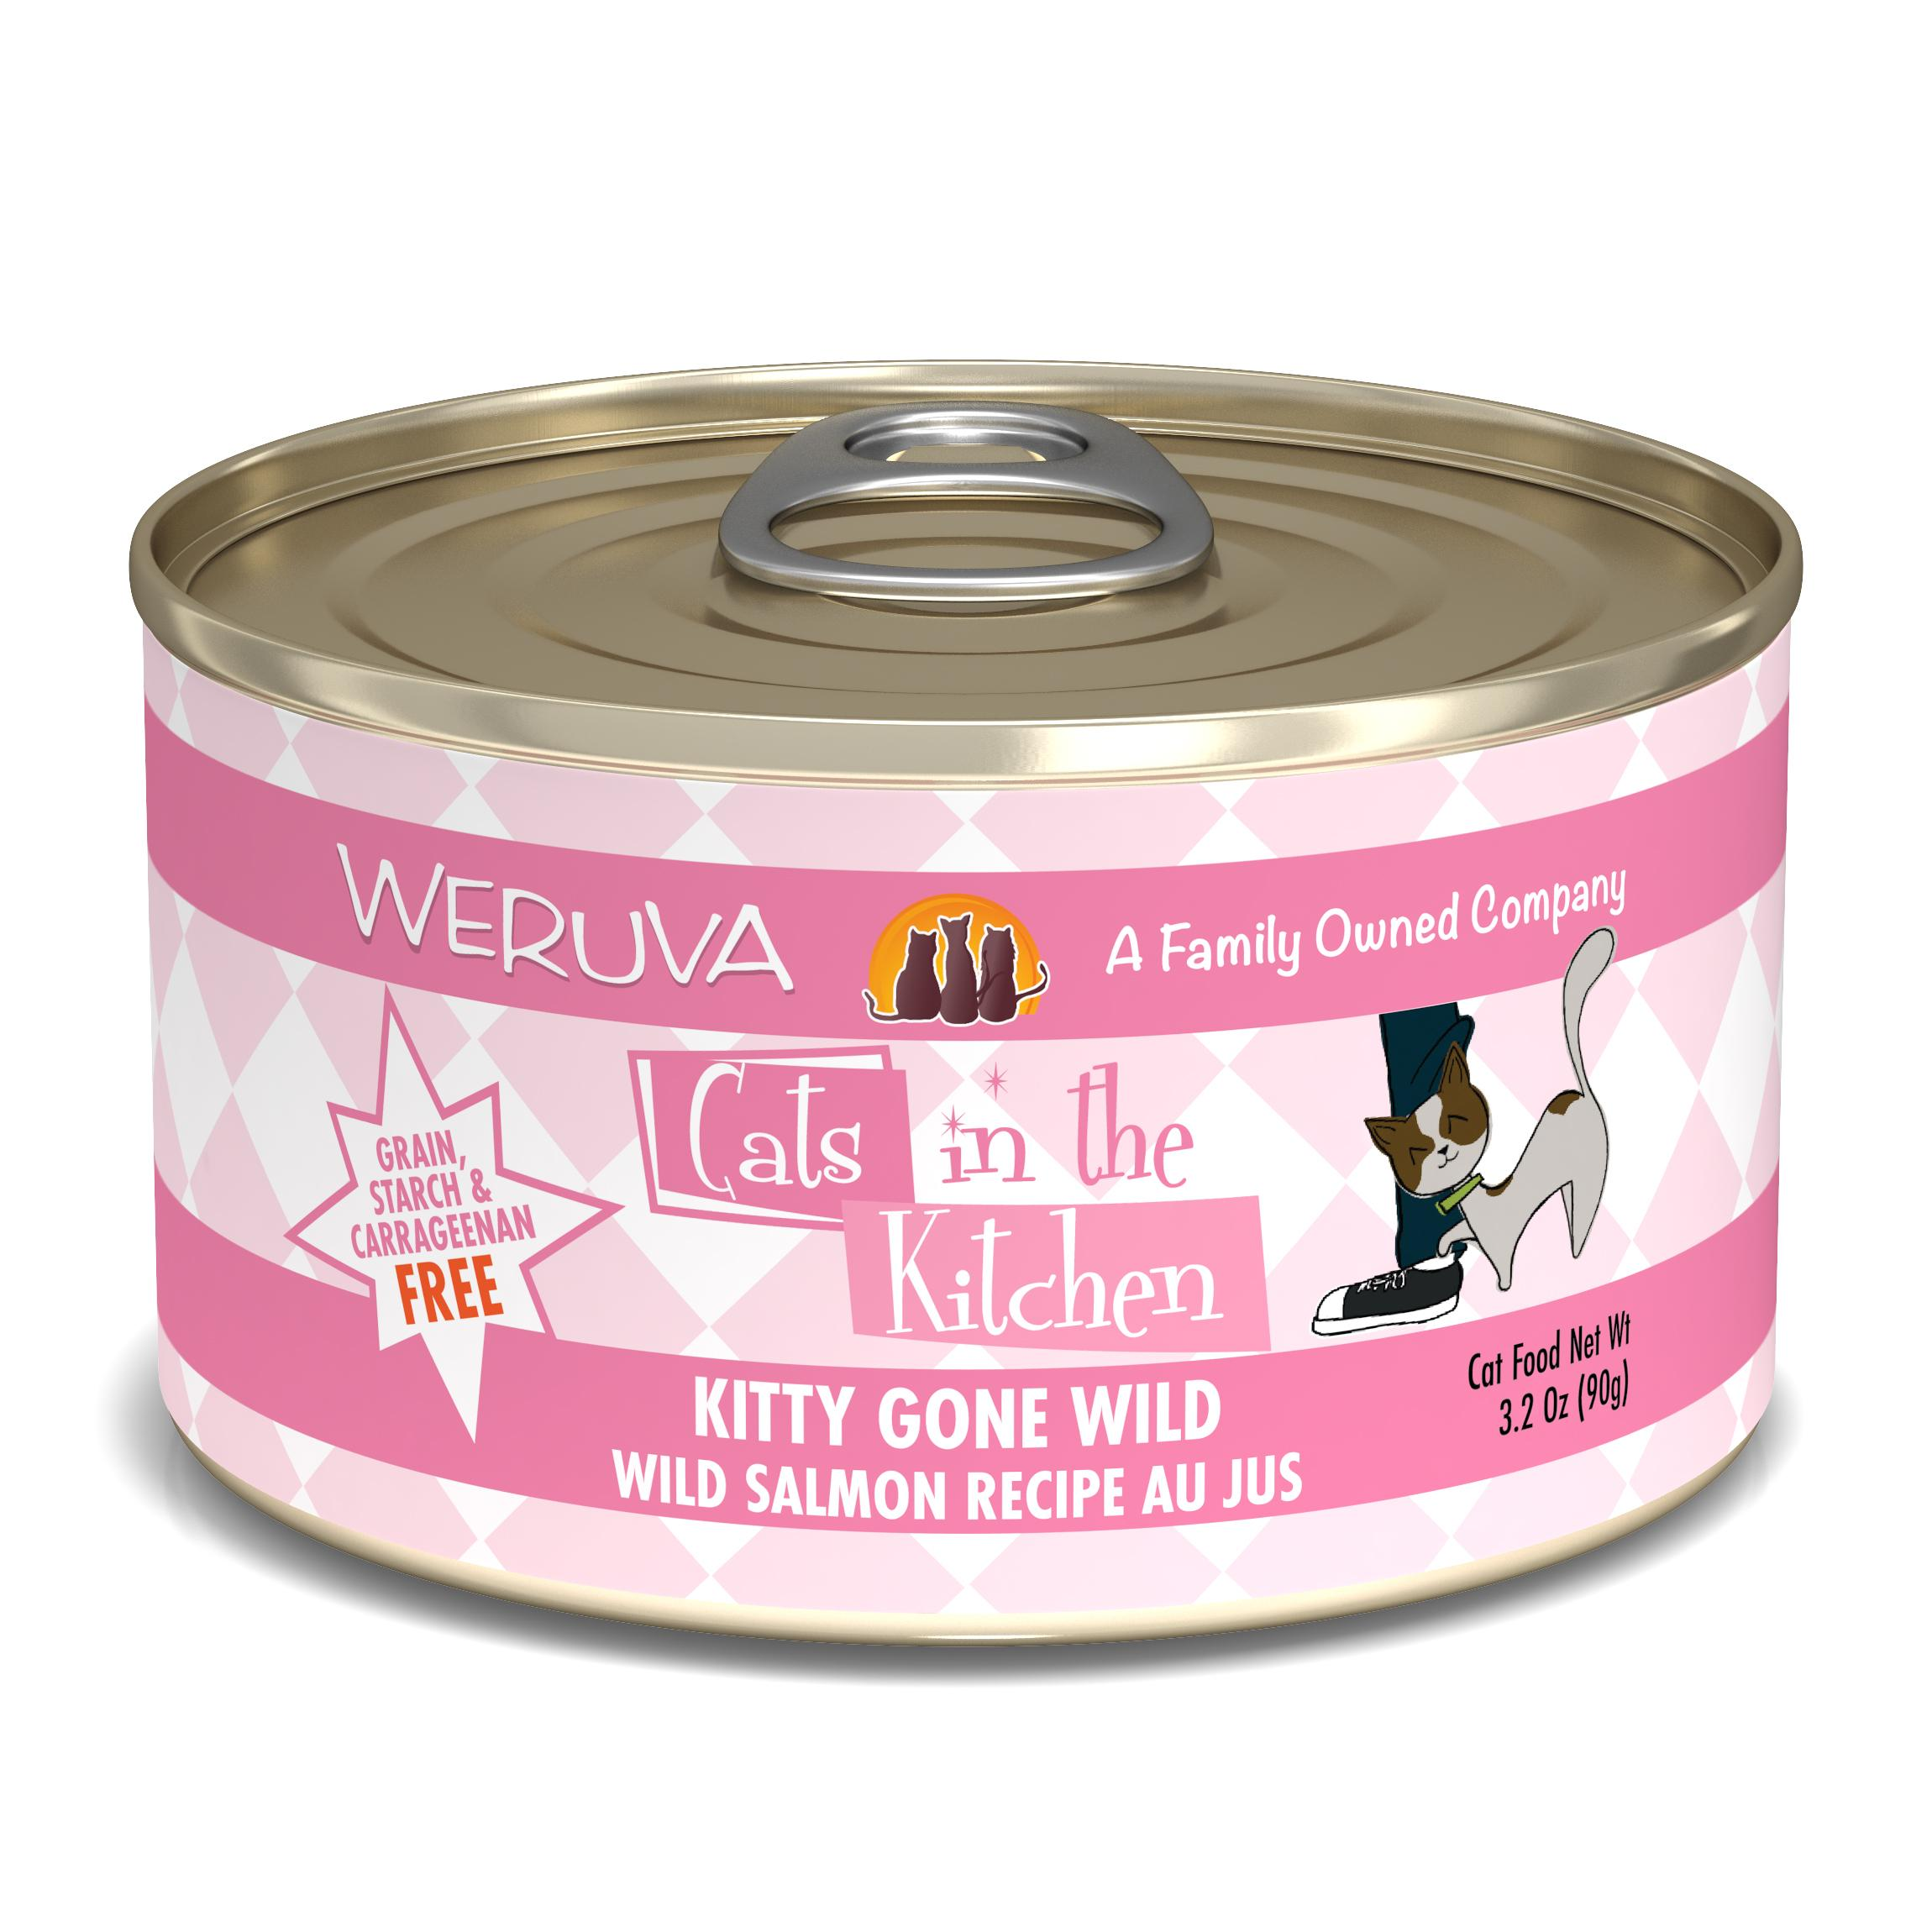 Weruva Cats in the Kitchen Kitty Gone Wild Salmon Au Jus Grain-Free Wet Cat Food Image